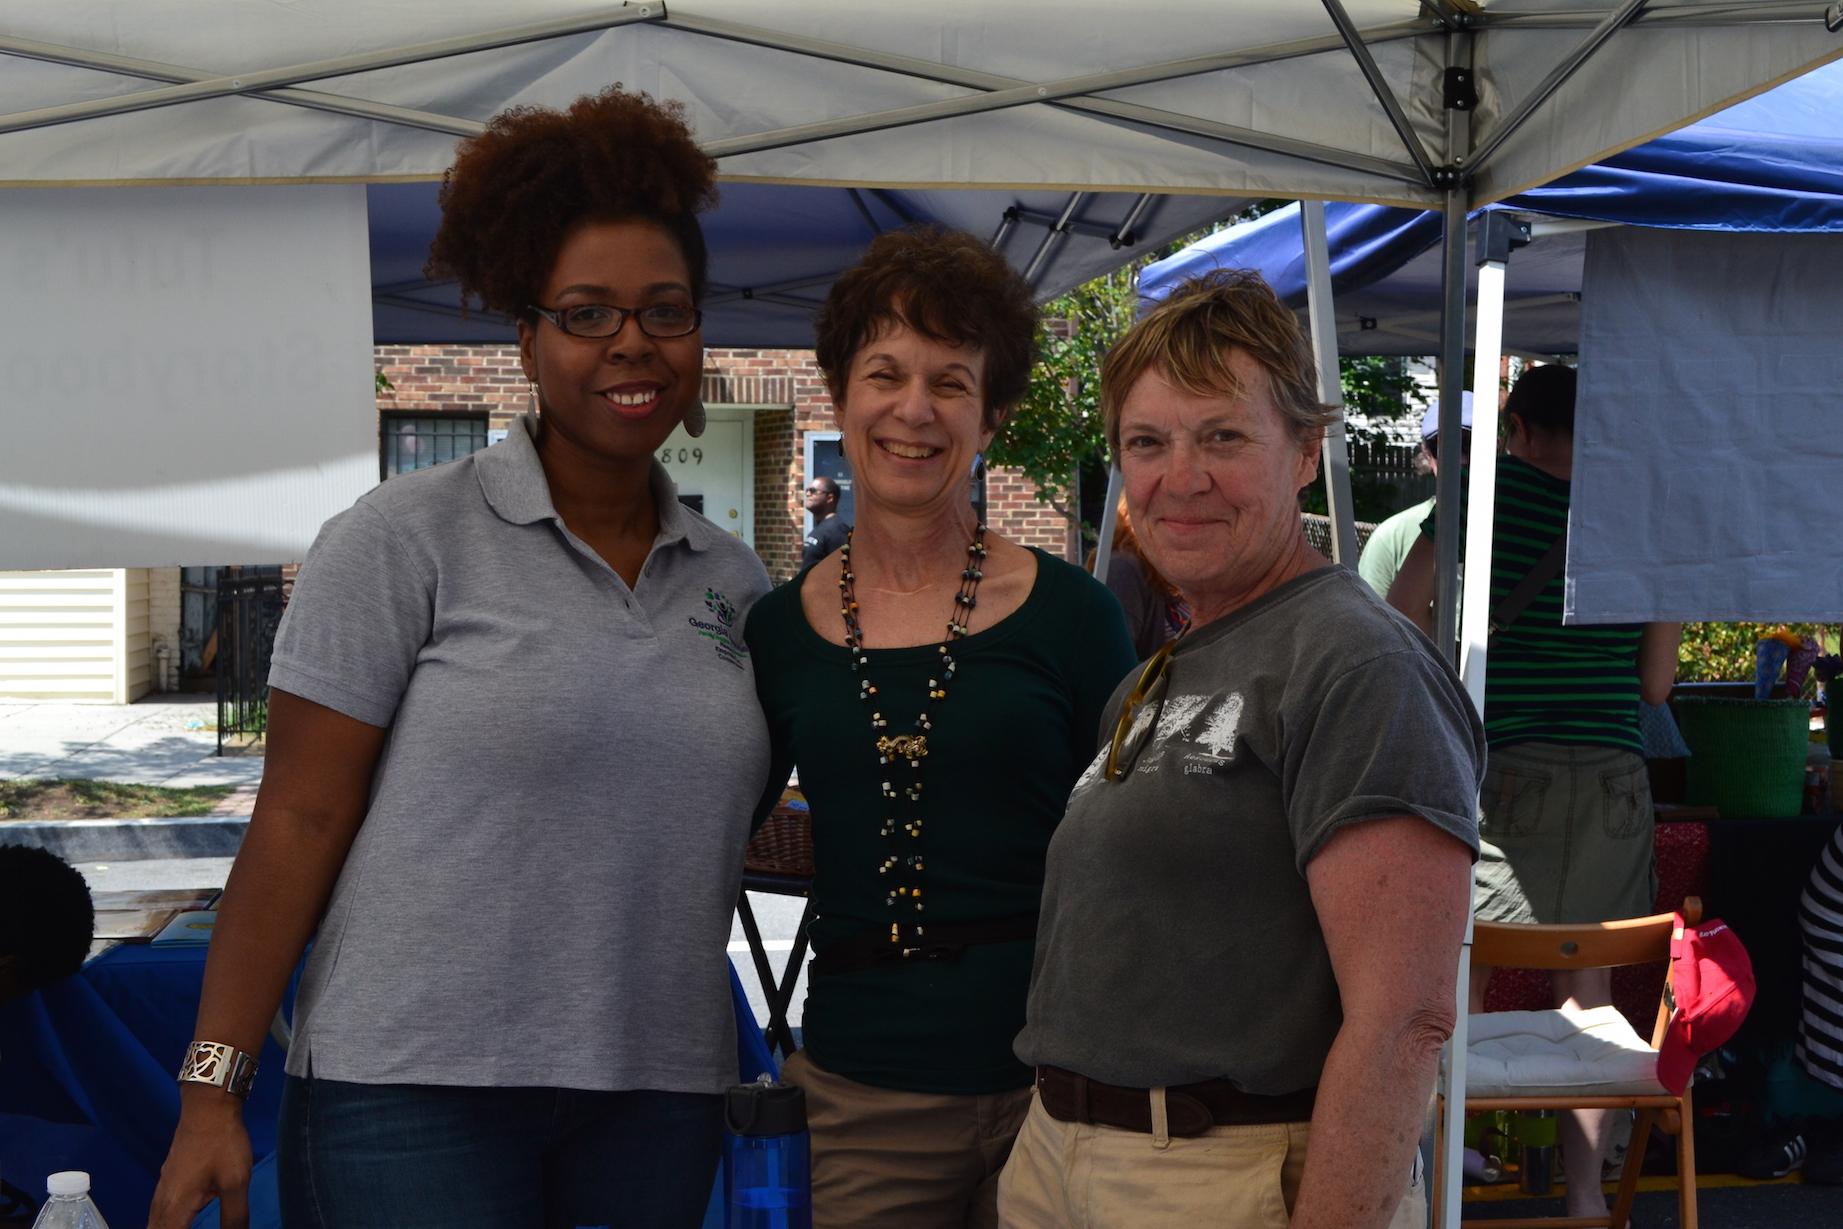 Shakira Gantt, Karen Feinstein and Carol Herwig from Georgia Avenue Family Support Collaborative.